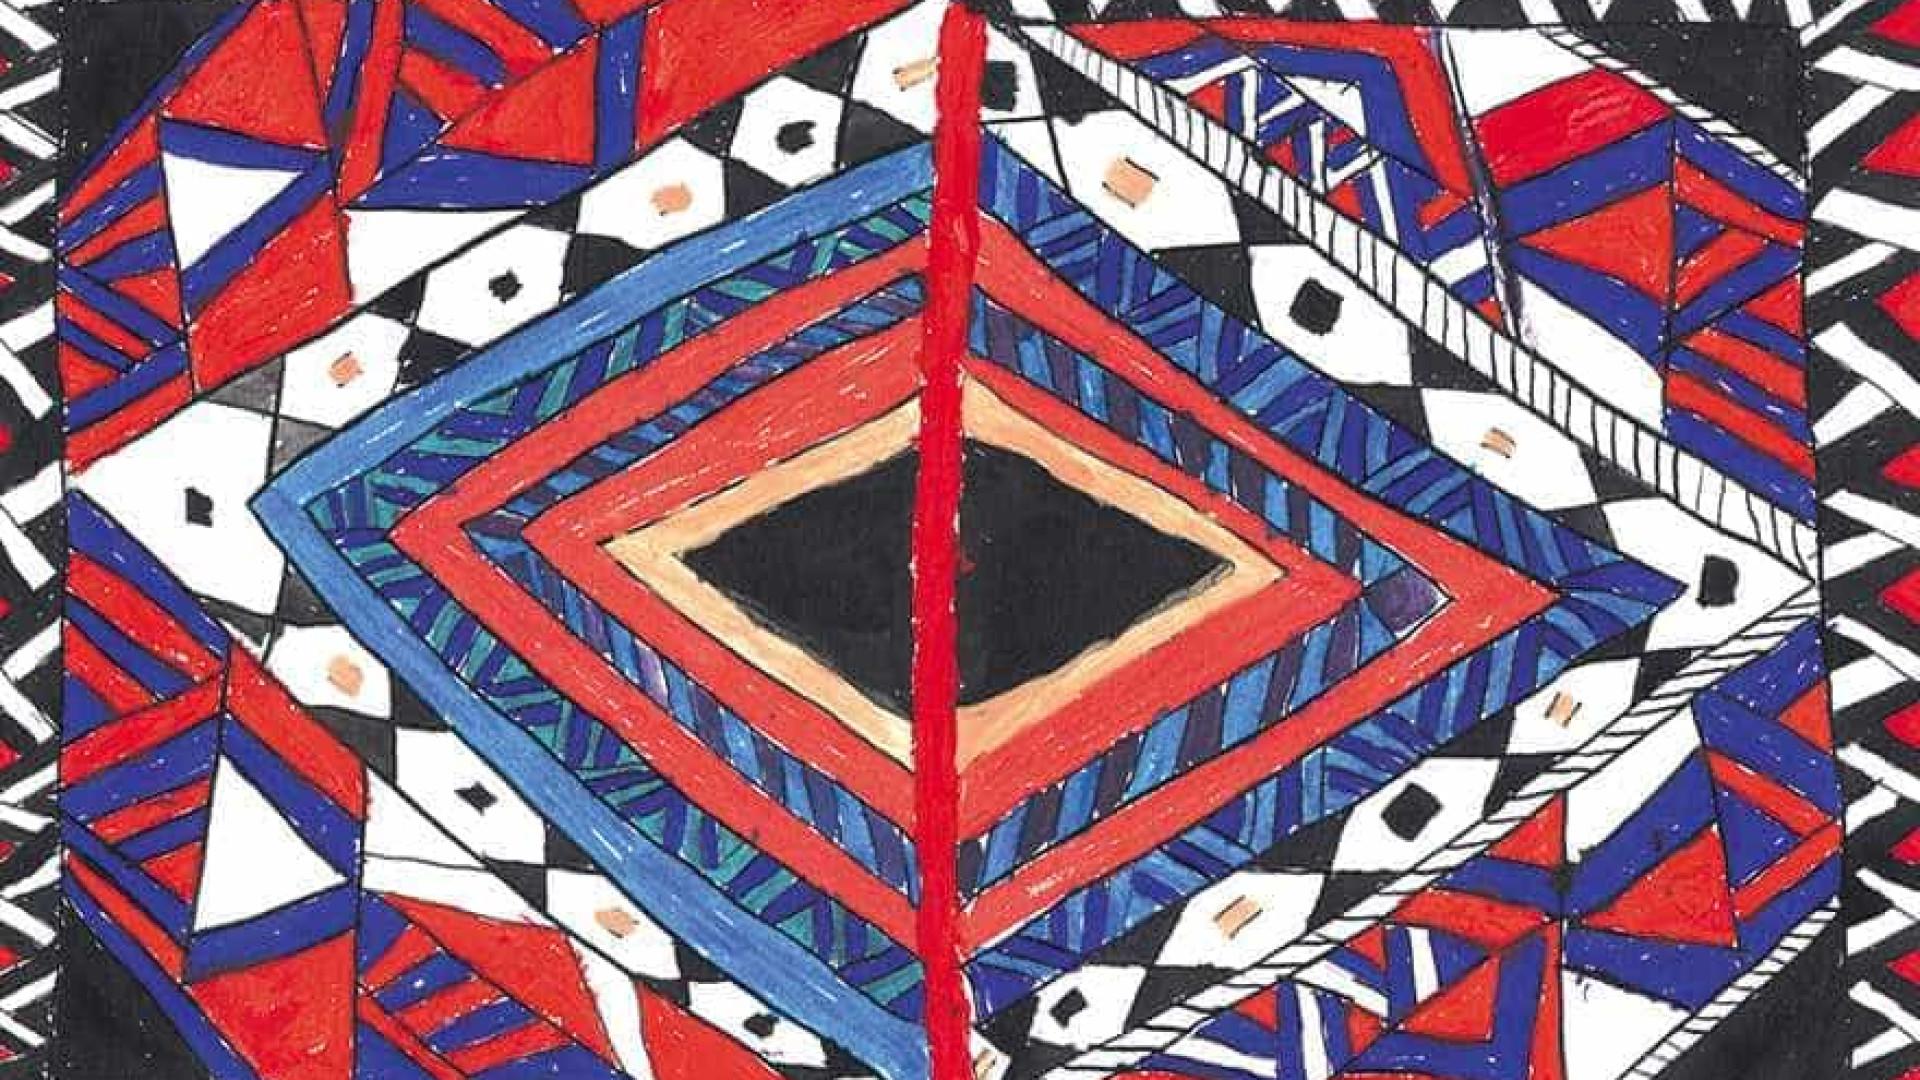 Conselho decidirá se arte Wajãpi ainda representa patrimônio brasileiro